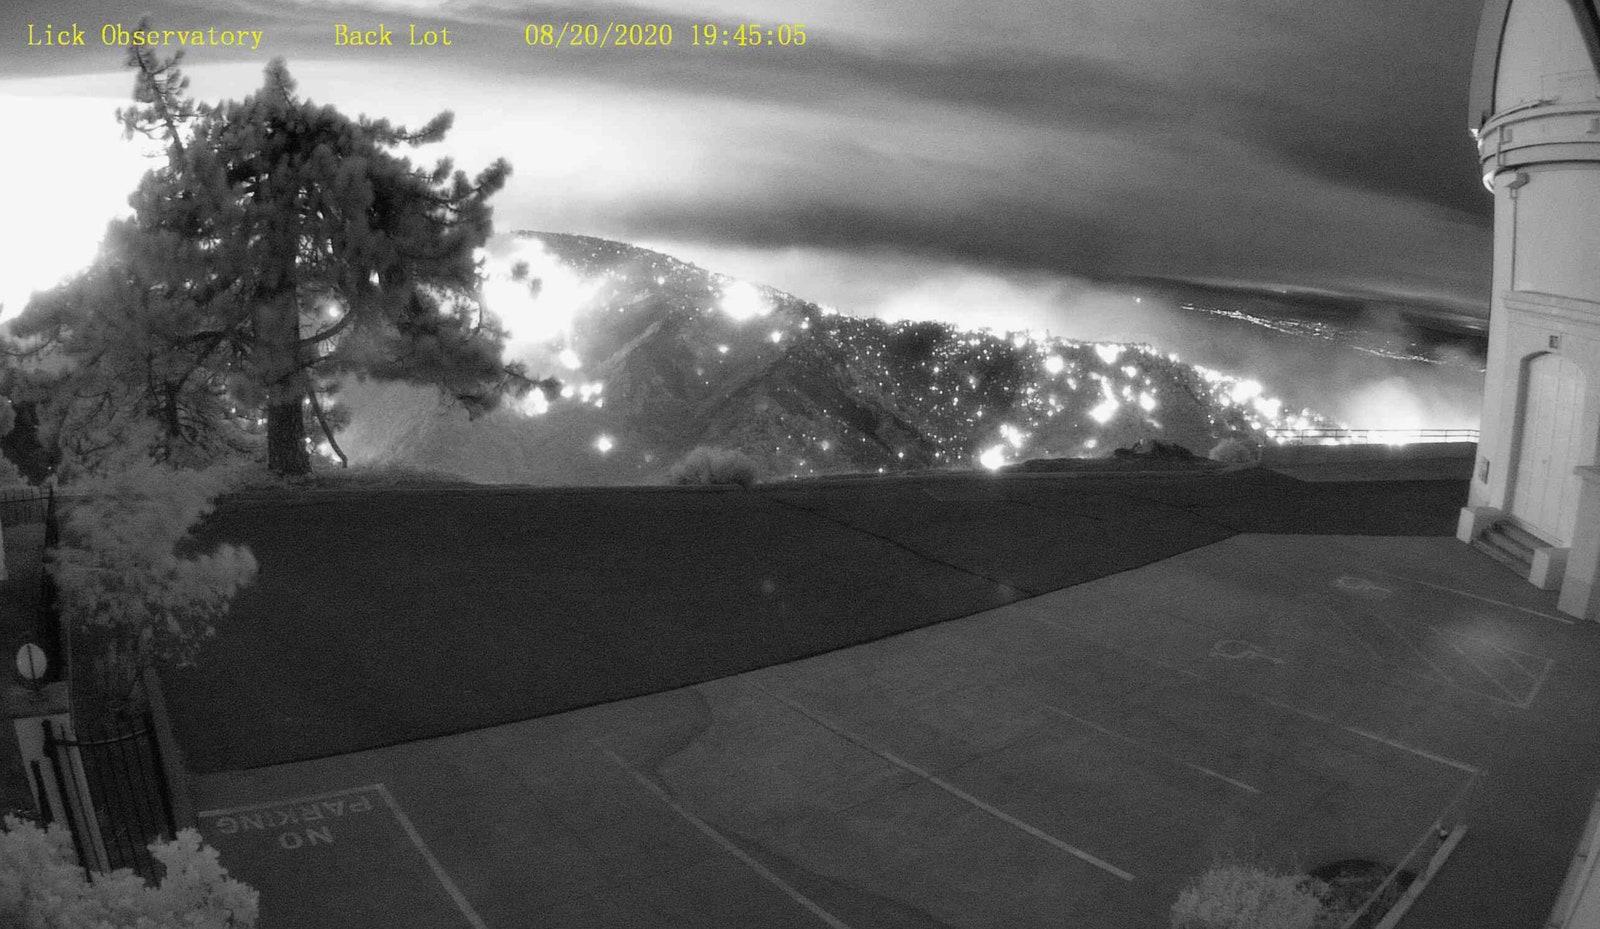 Fires burn near Lick Observatory